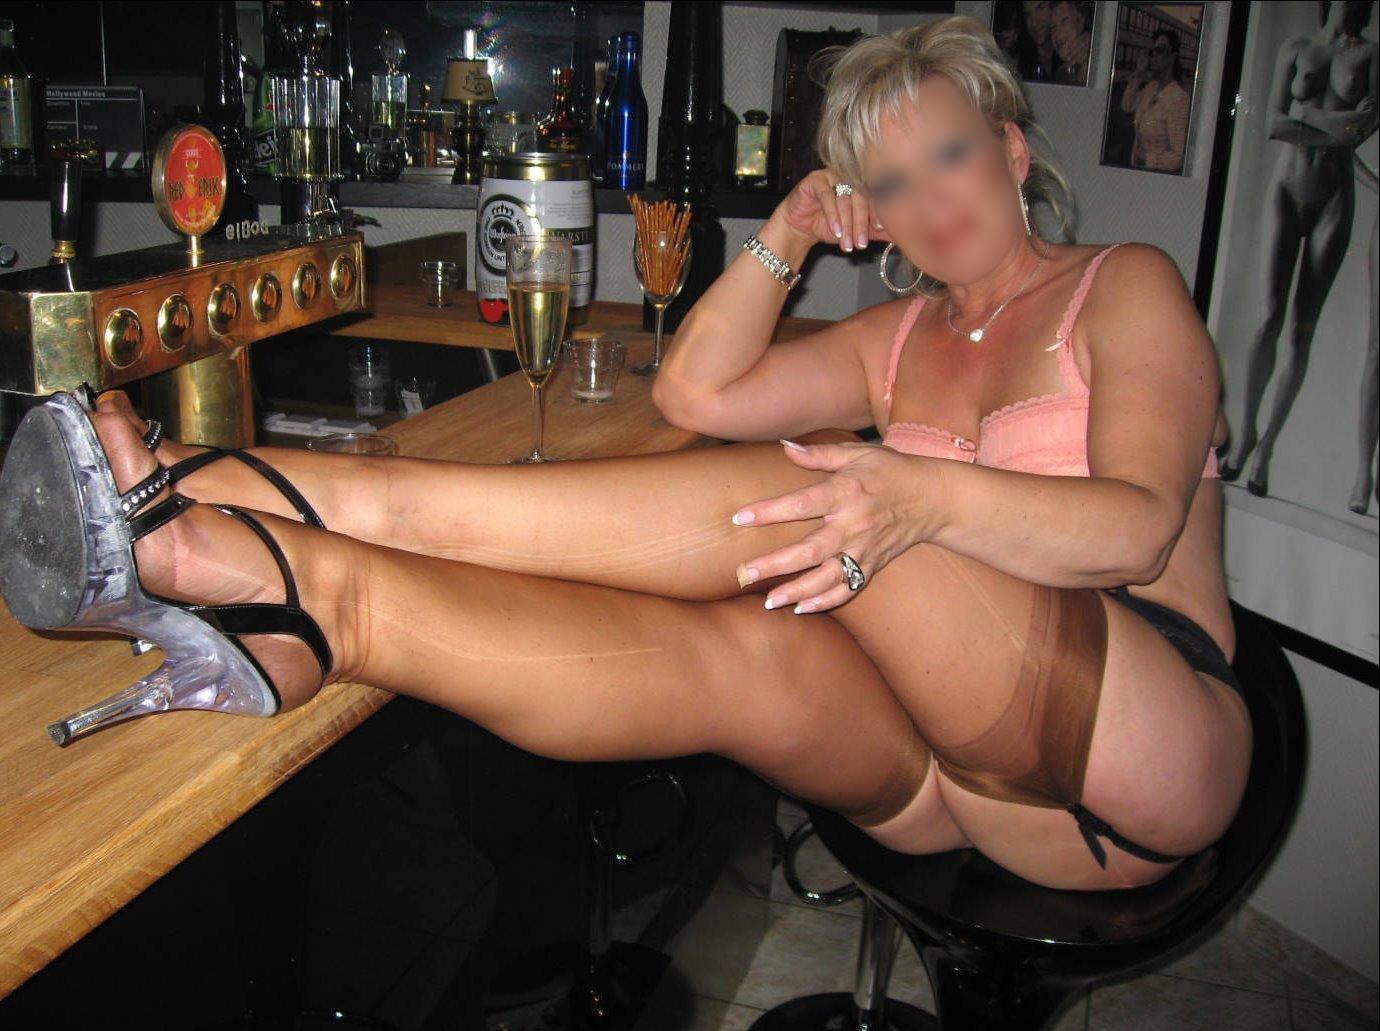 Femme mûre dans un club privé libertin